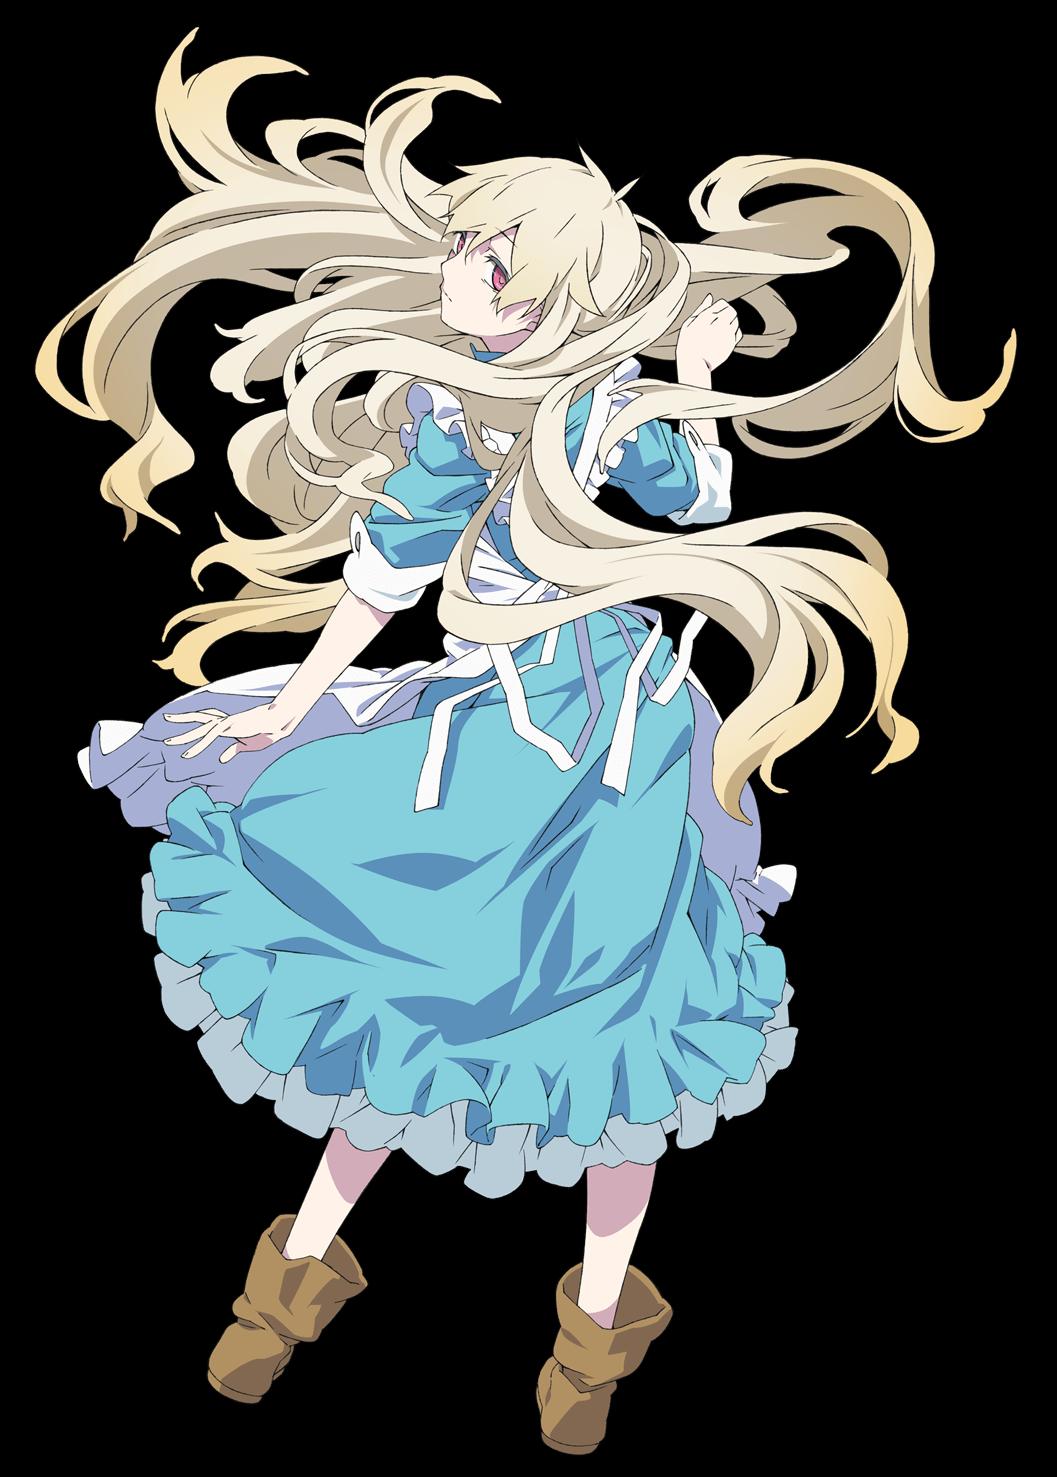 http://ami.animecharactersdatabase.com/uploads/chars/11498-2140113362.png